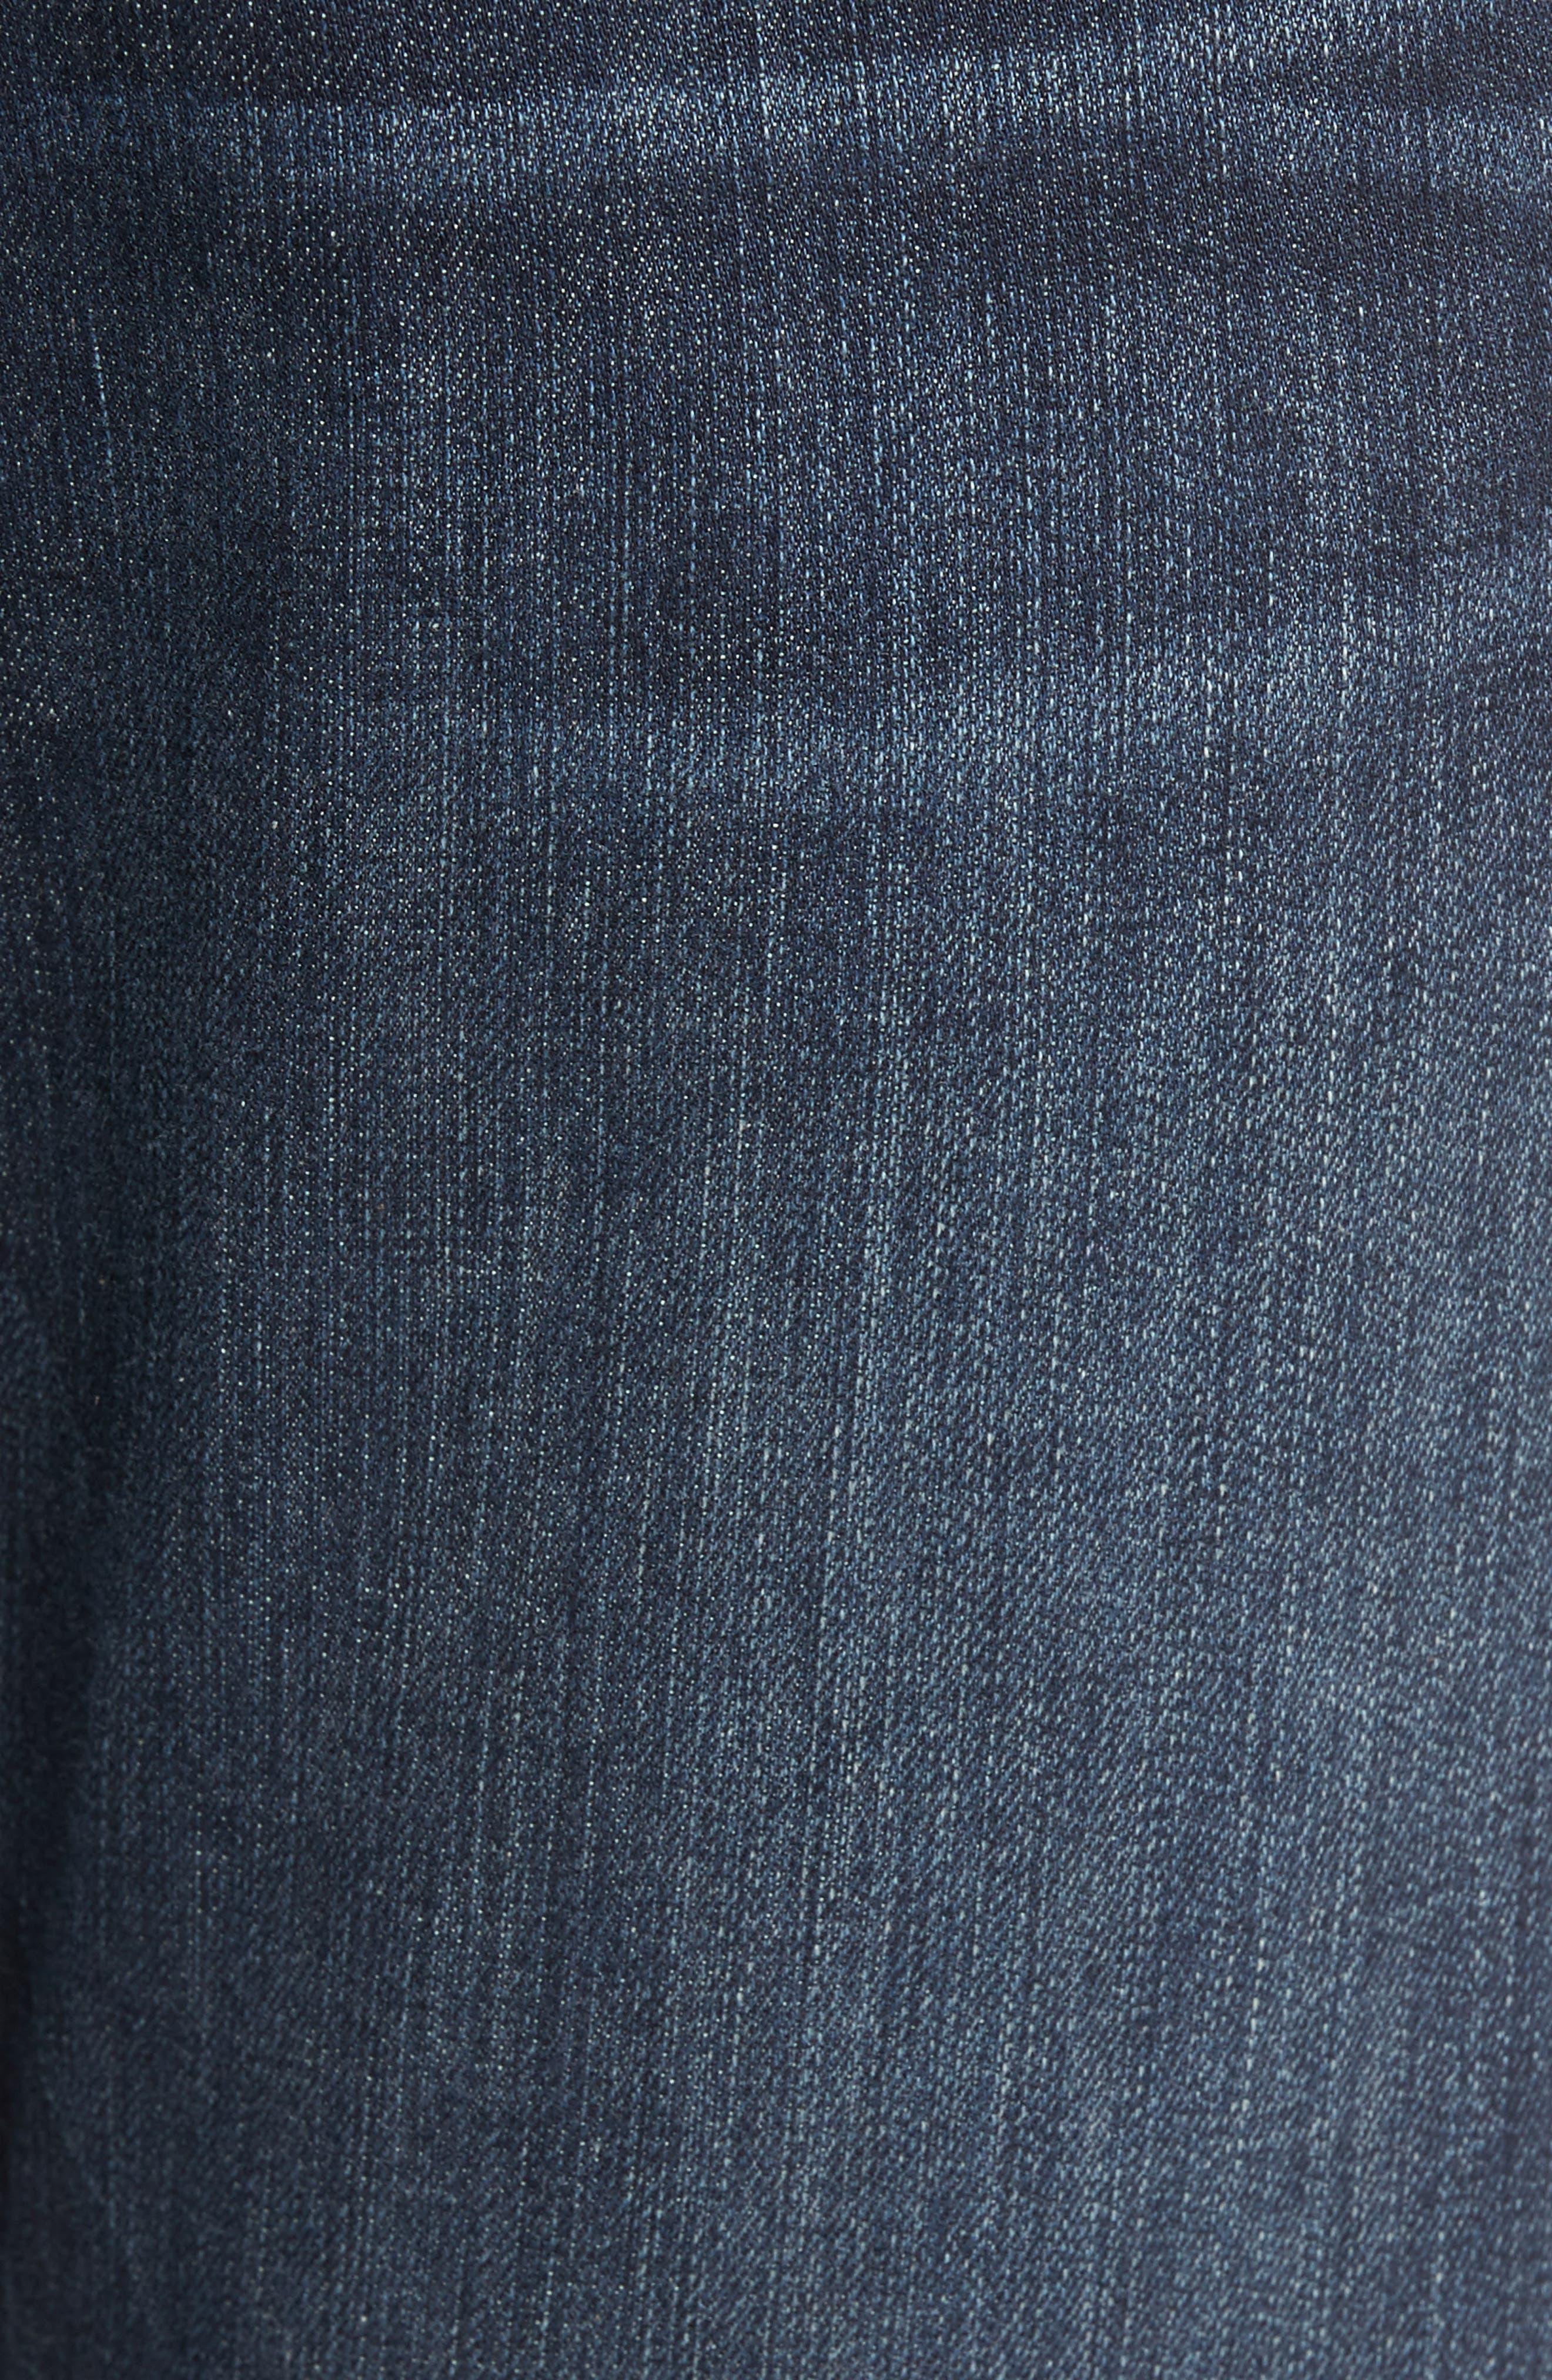 PAIGE,                             Legacy - Federal Slim Straight Leg Jeans,                             Alternate thumbnail 5, color,                             400